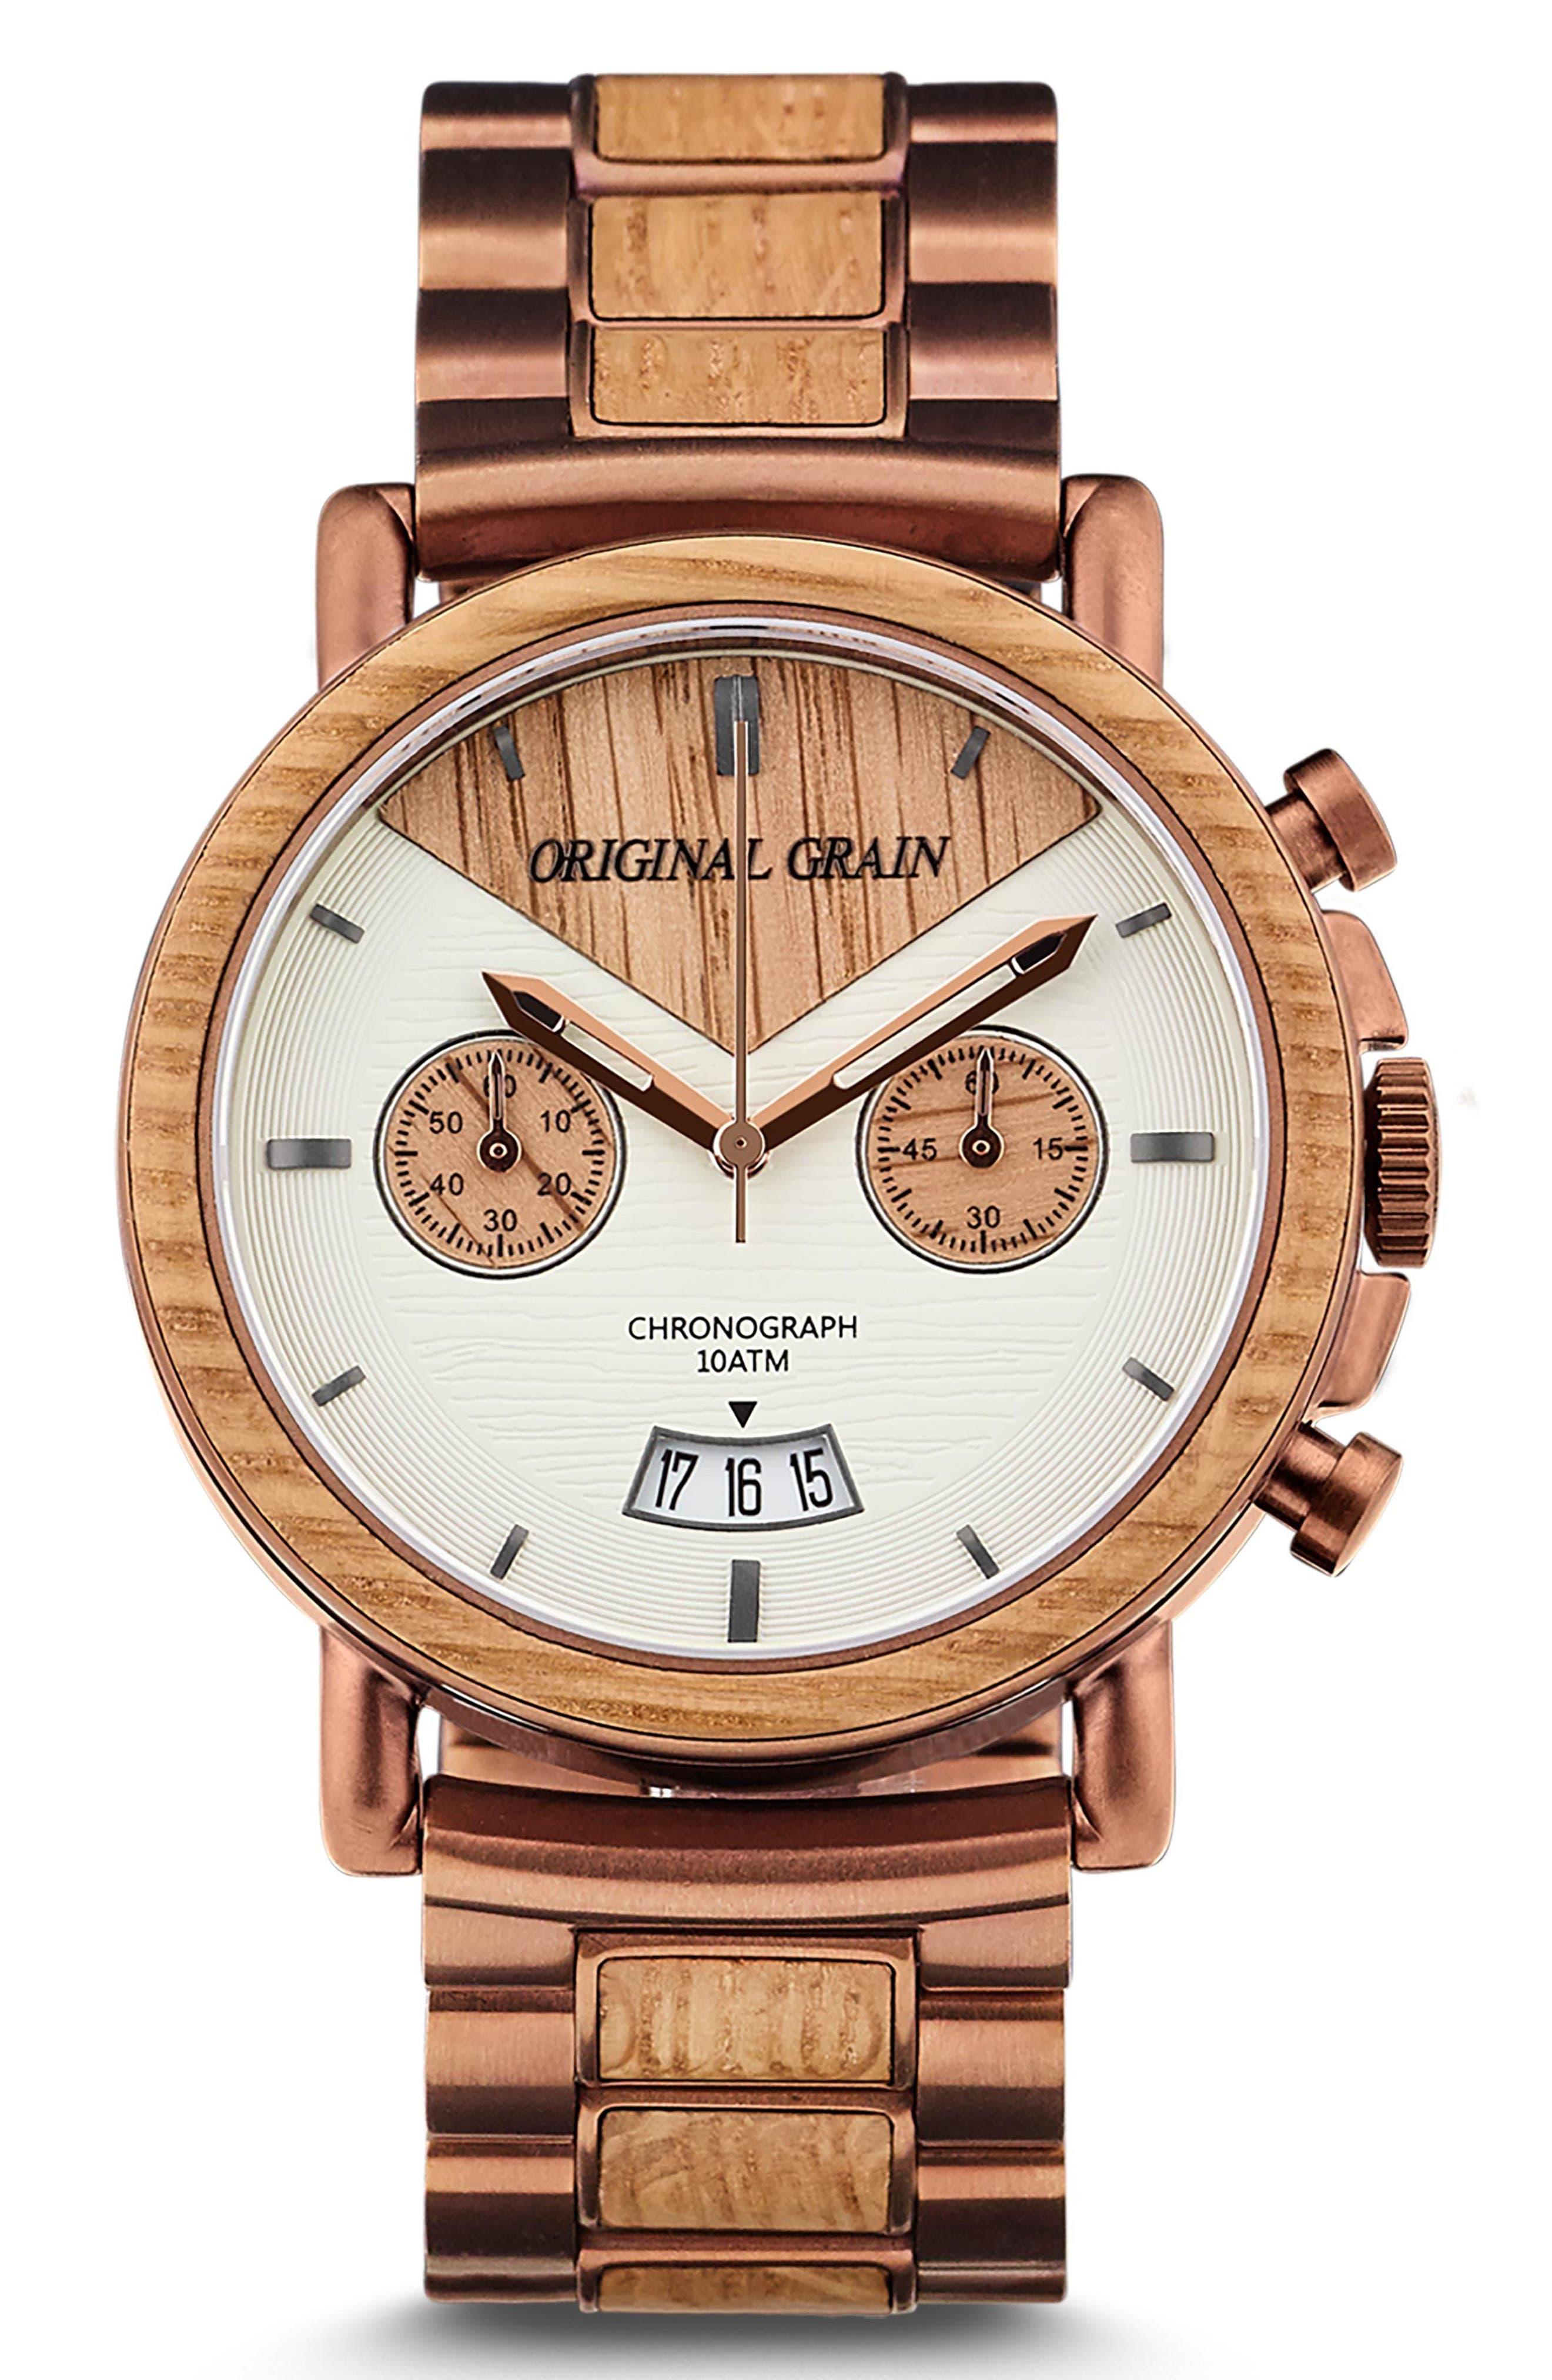 Alternate Image 1 Selected - Original Grain Alterra Chronograph Bracelet Watch, 44mm